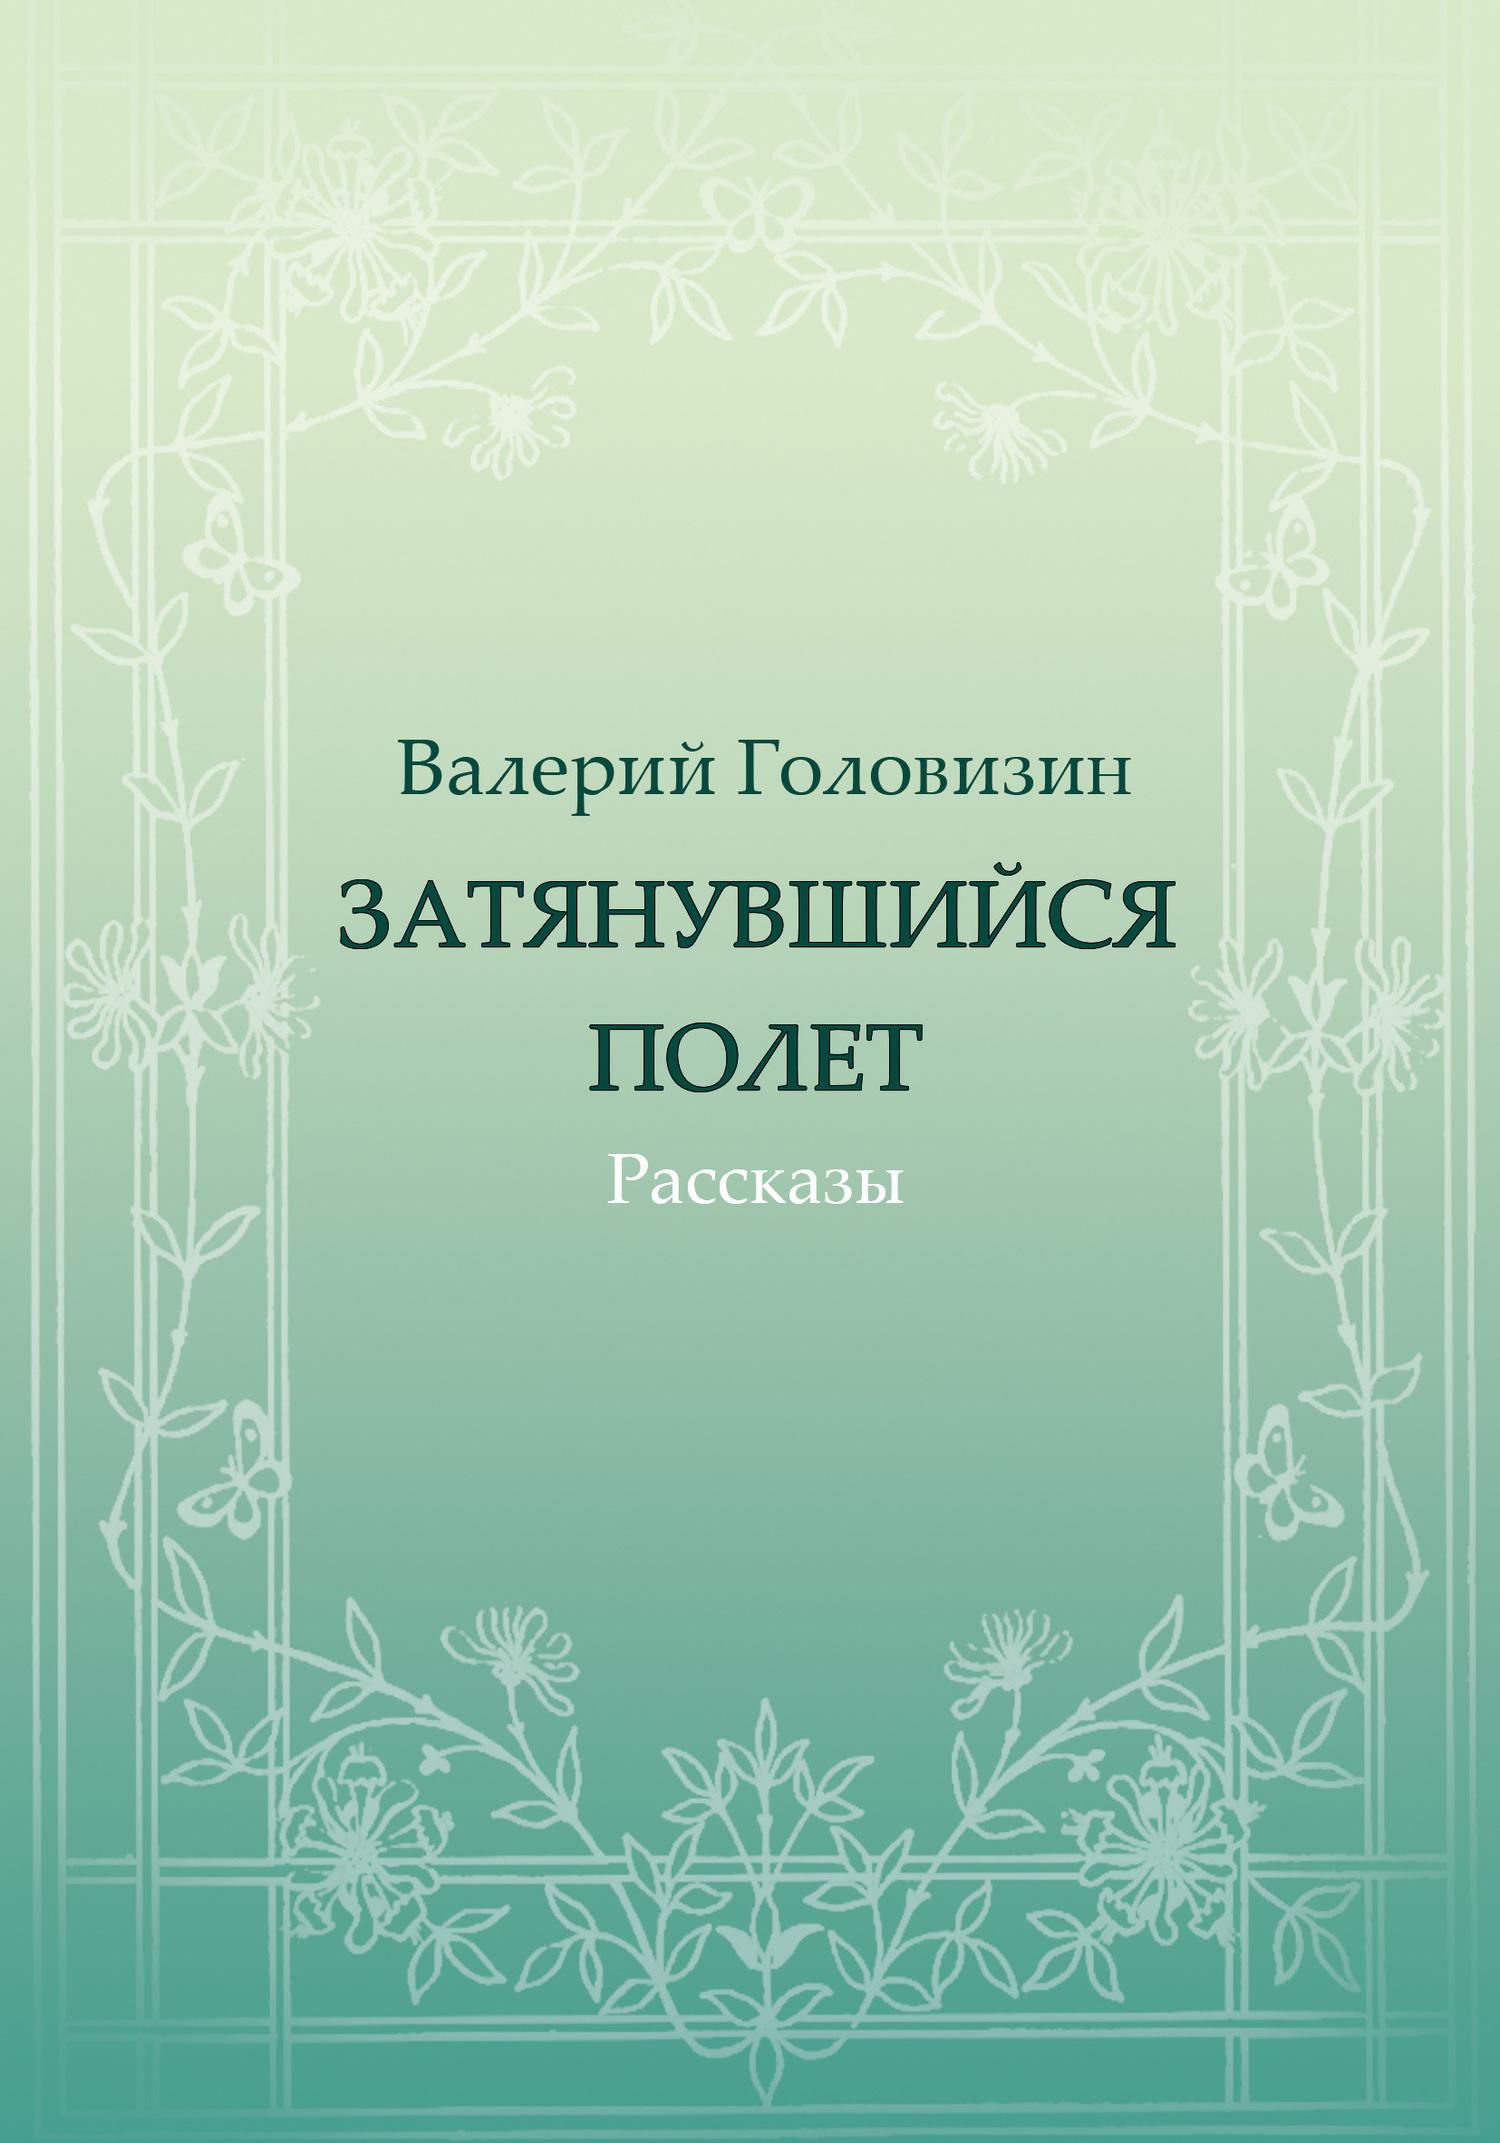 Валерий Головизин бесплатно